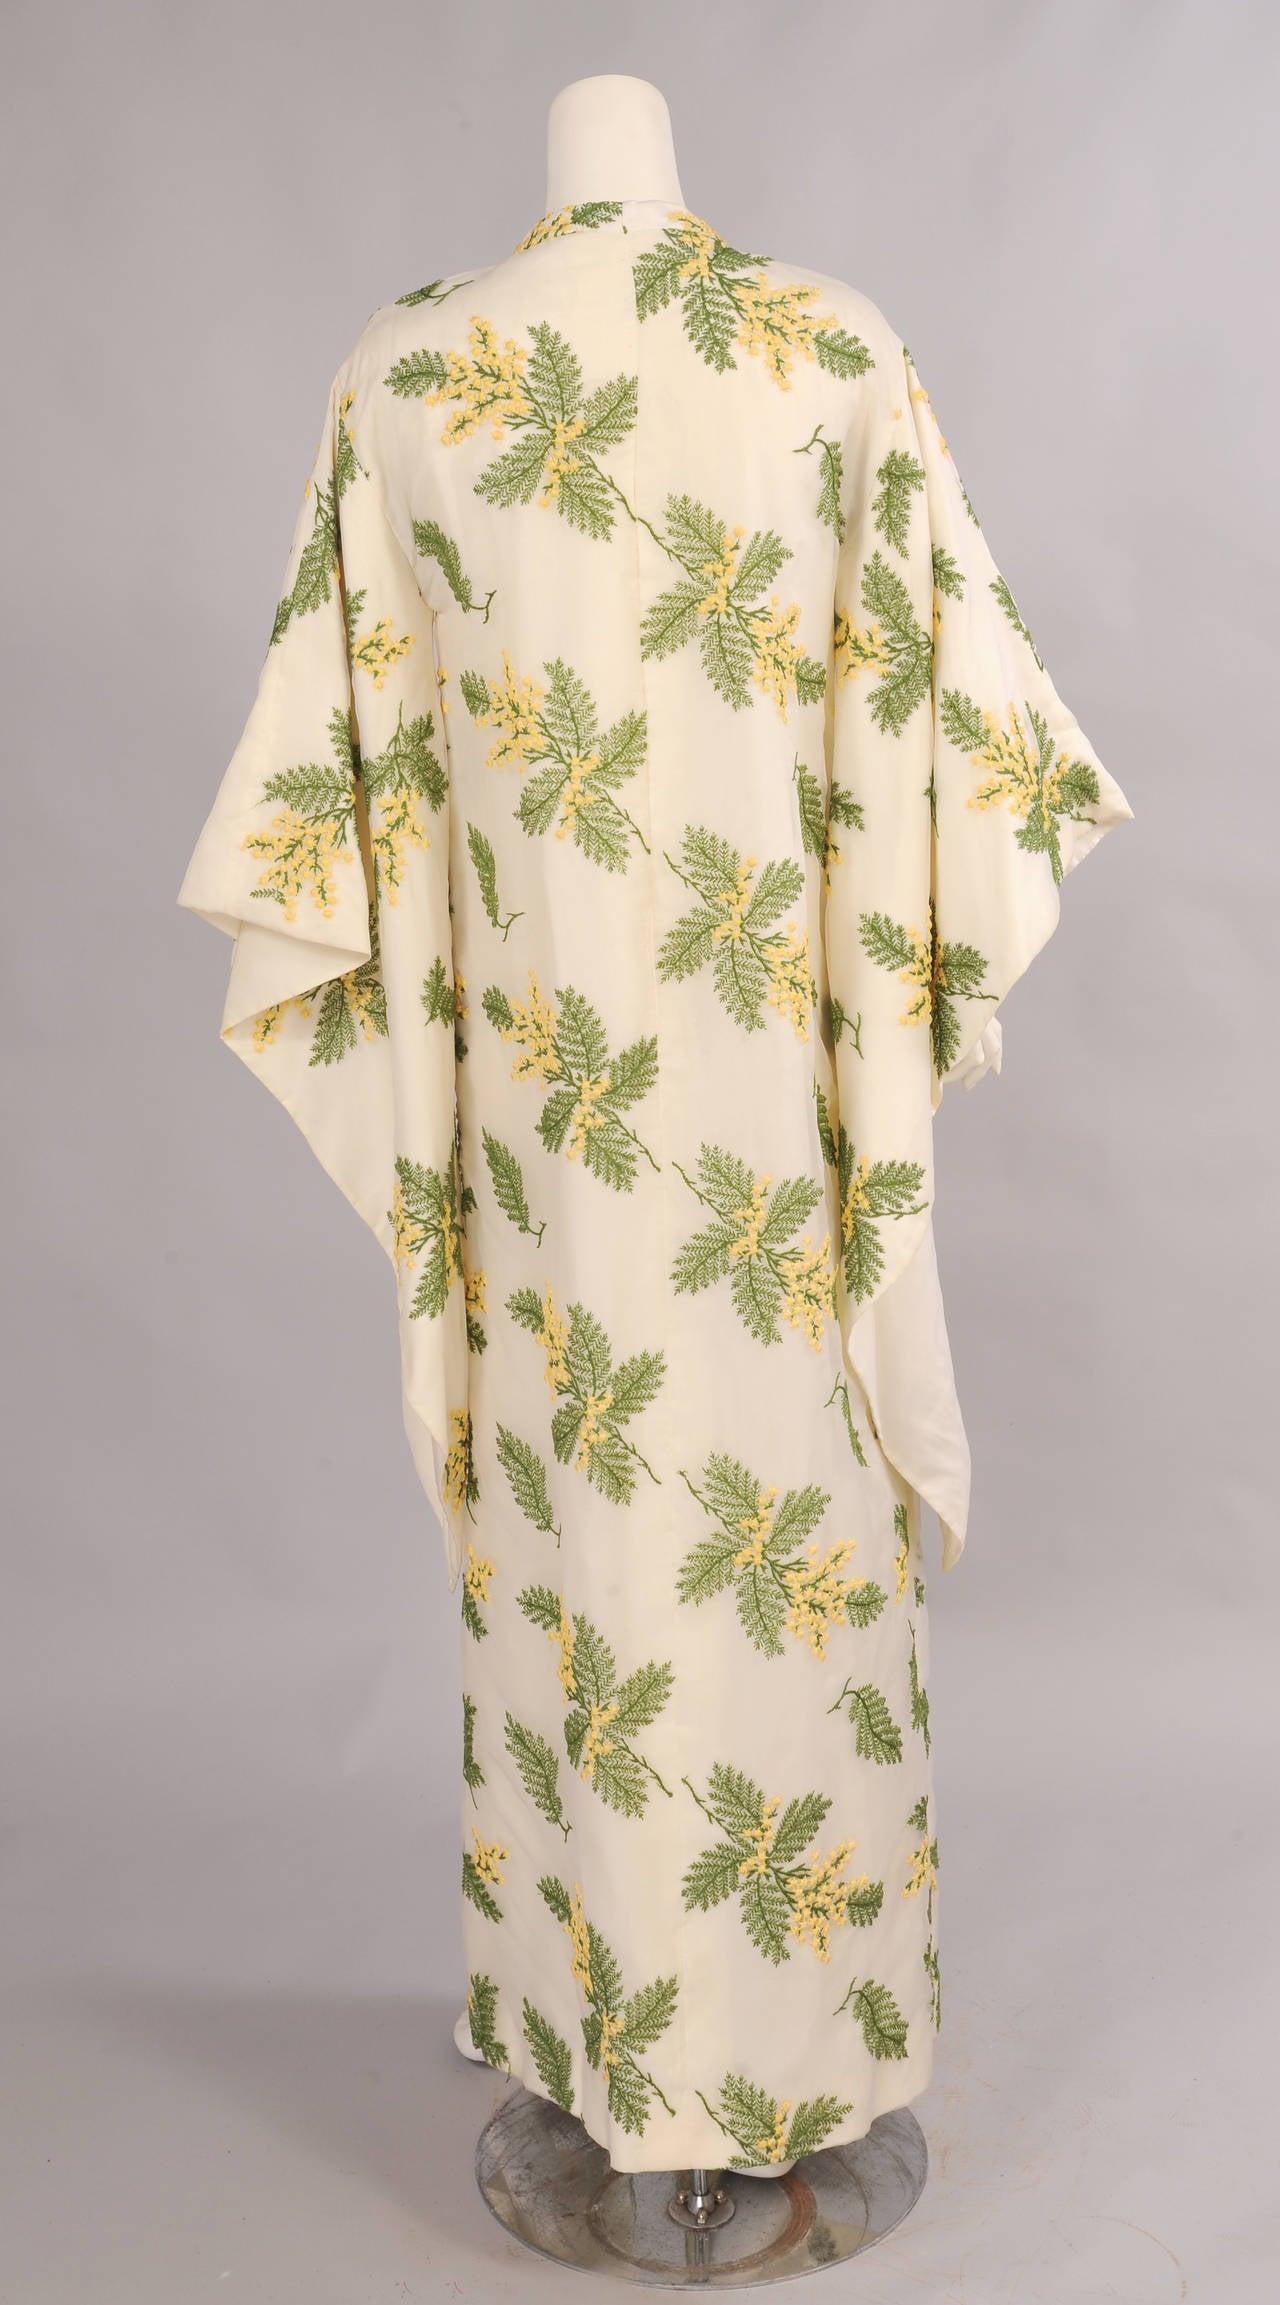 Bergdorf Goodman Lavishly Embroidered Silk Organza Coat 3